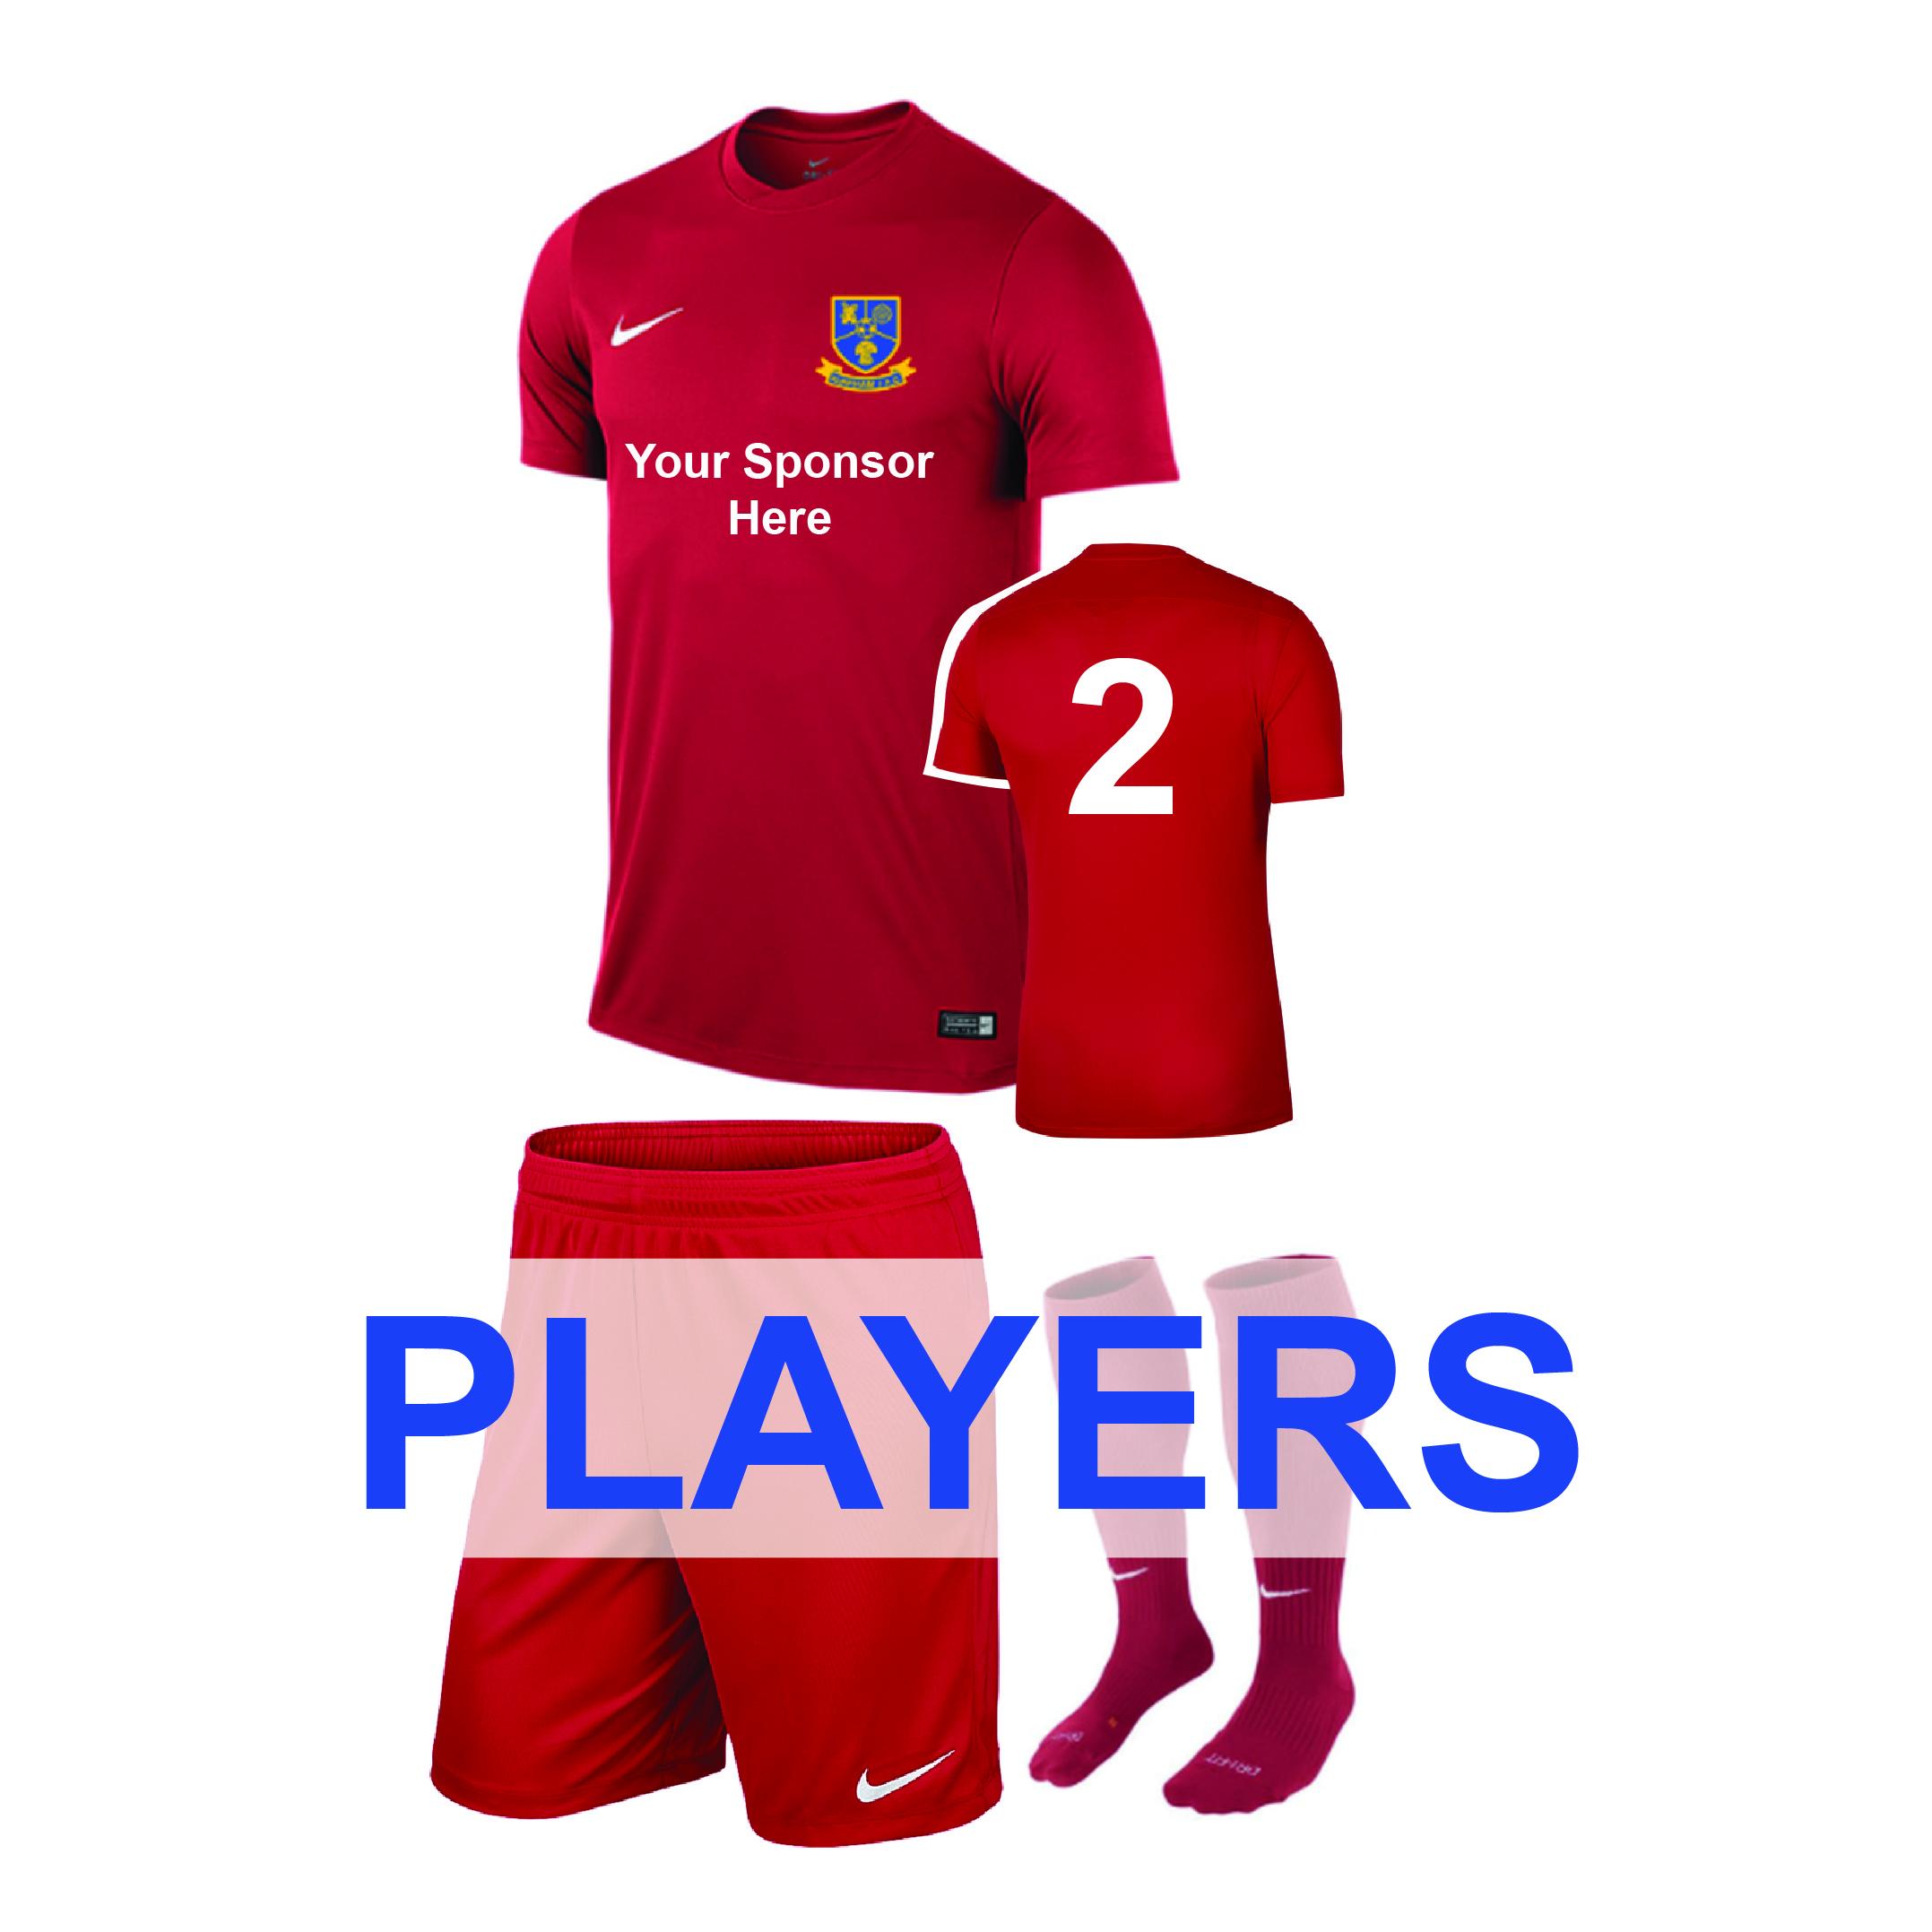 logos-for-club-shop-20.jpg